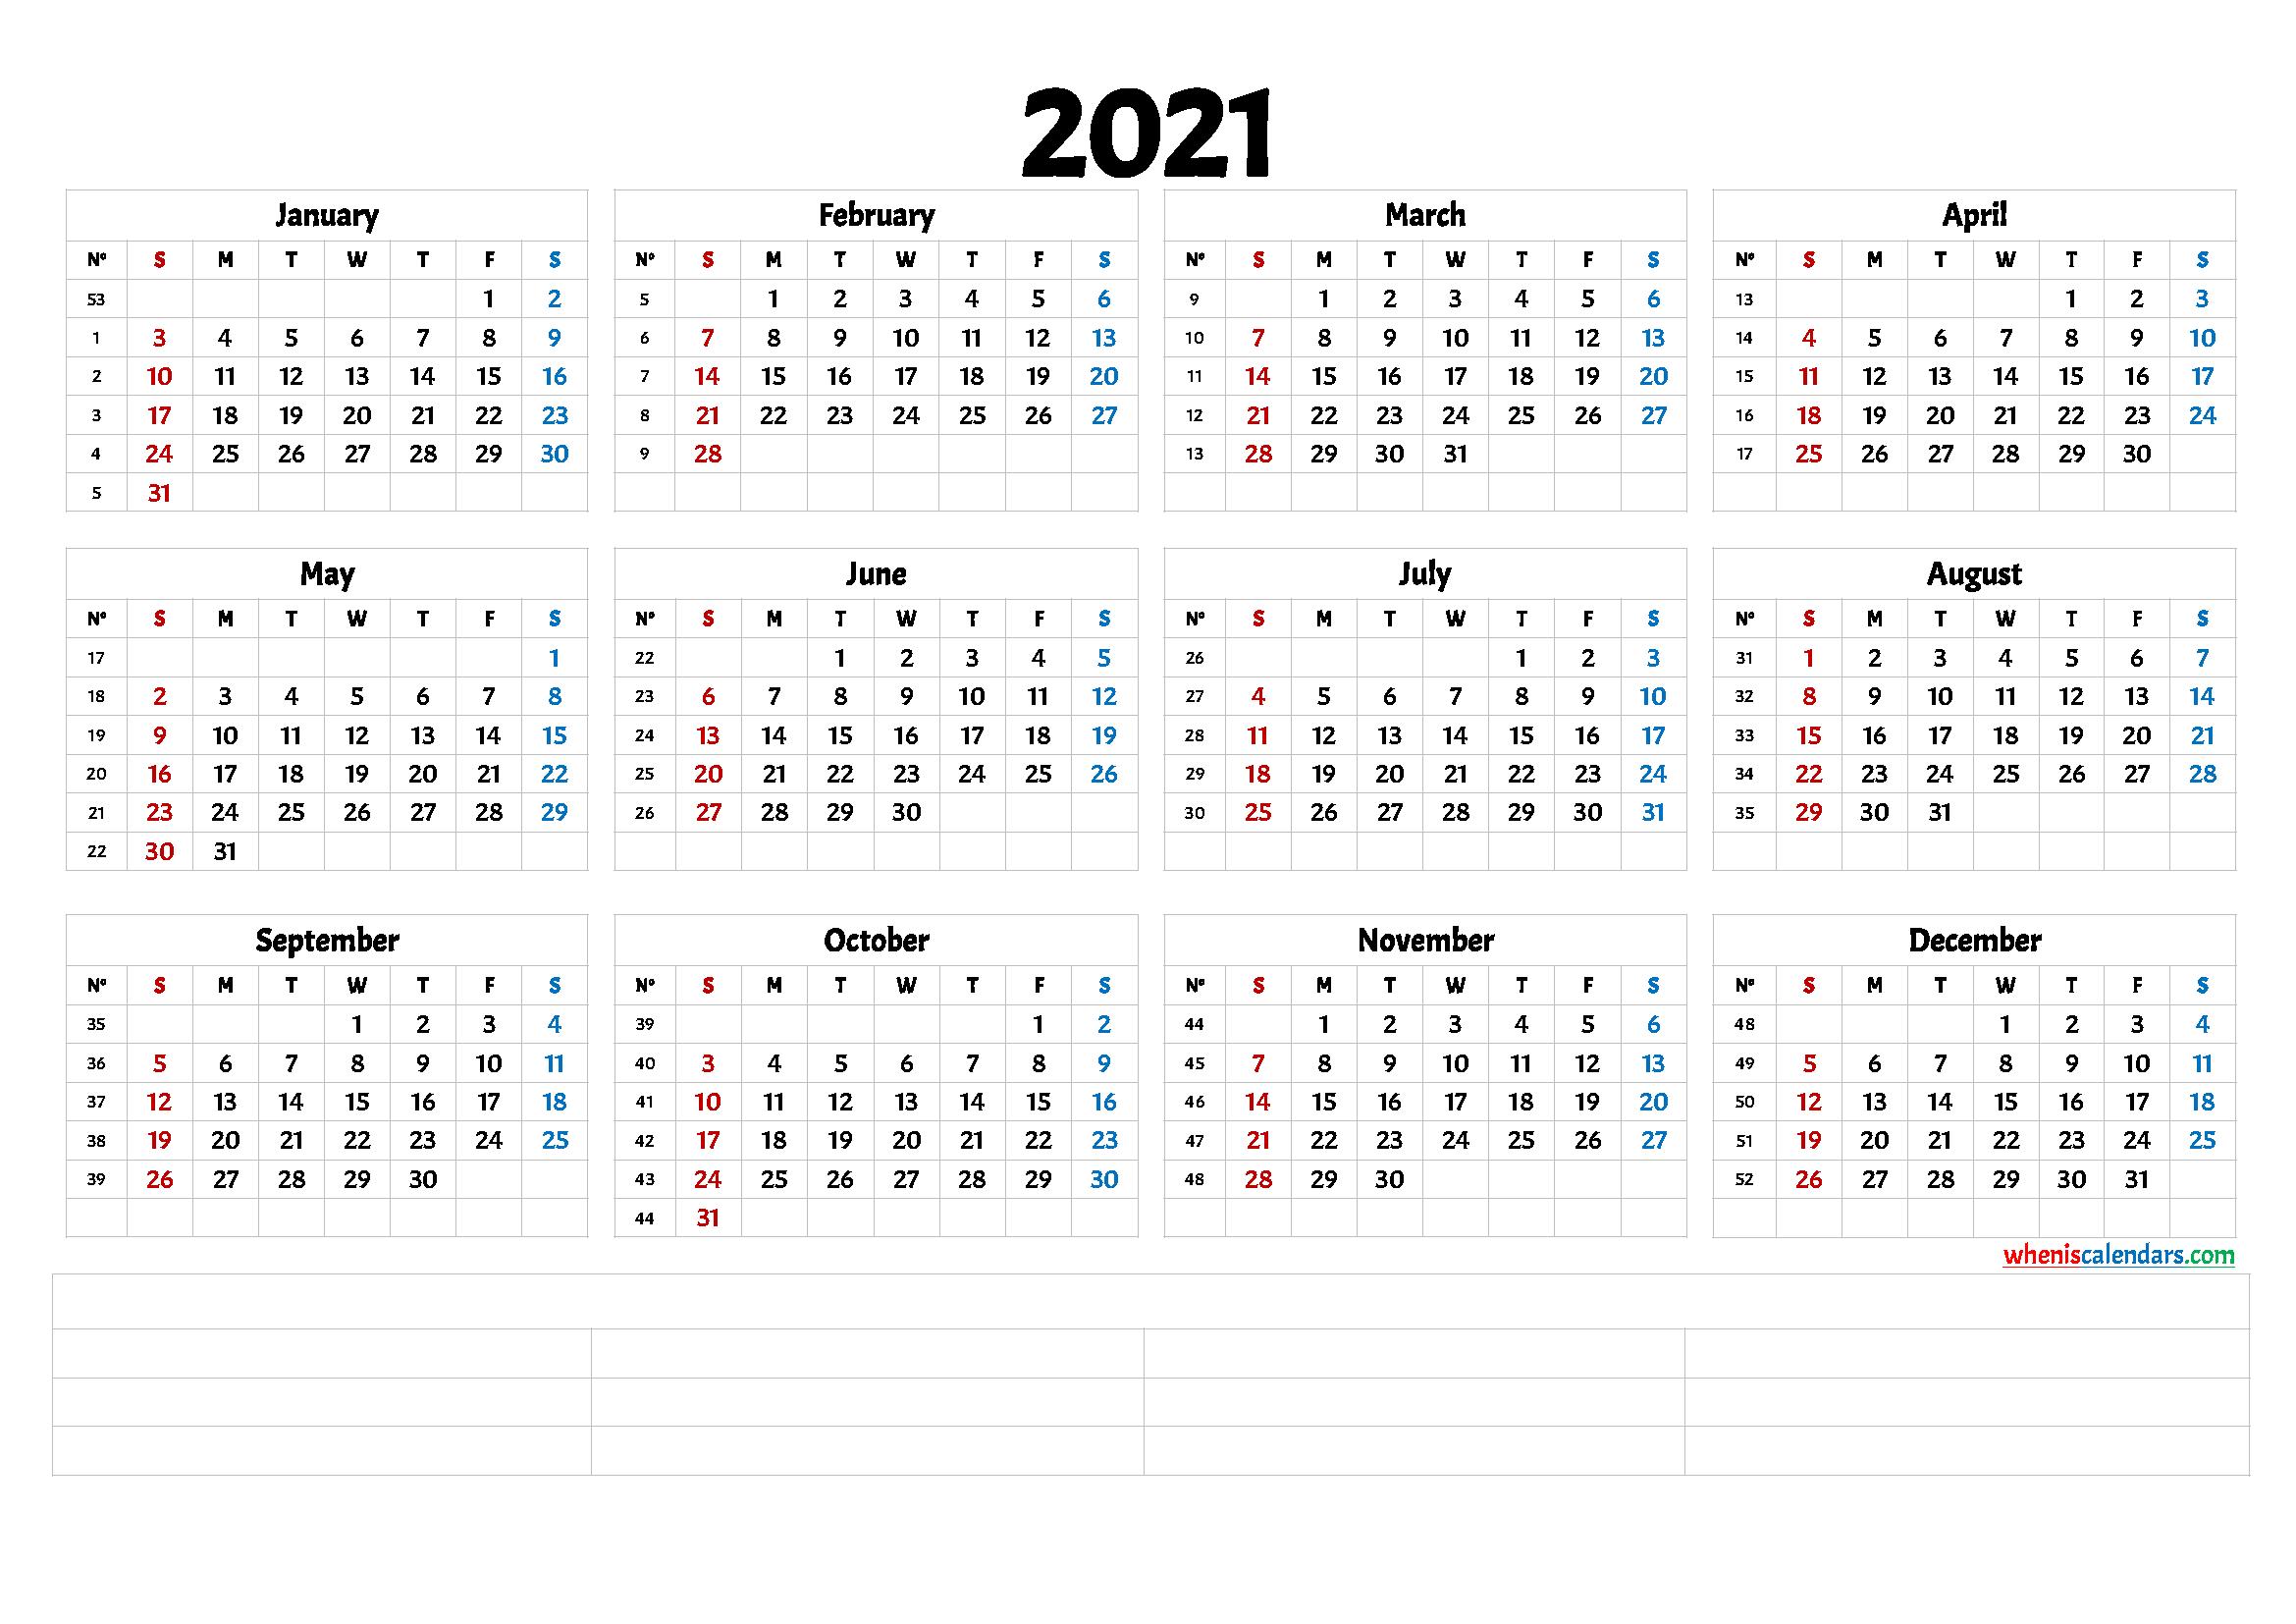 2021 Printable Yearly Calendar With Week Numbers